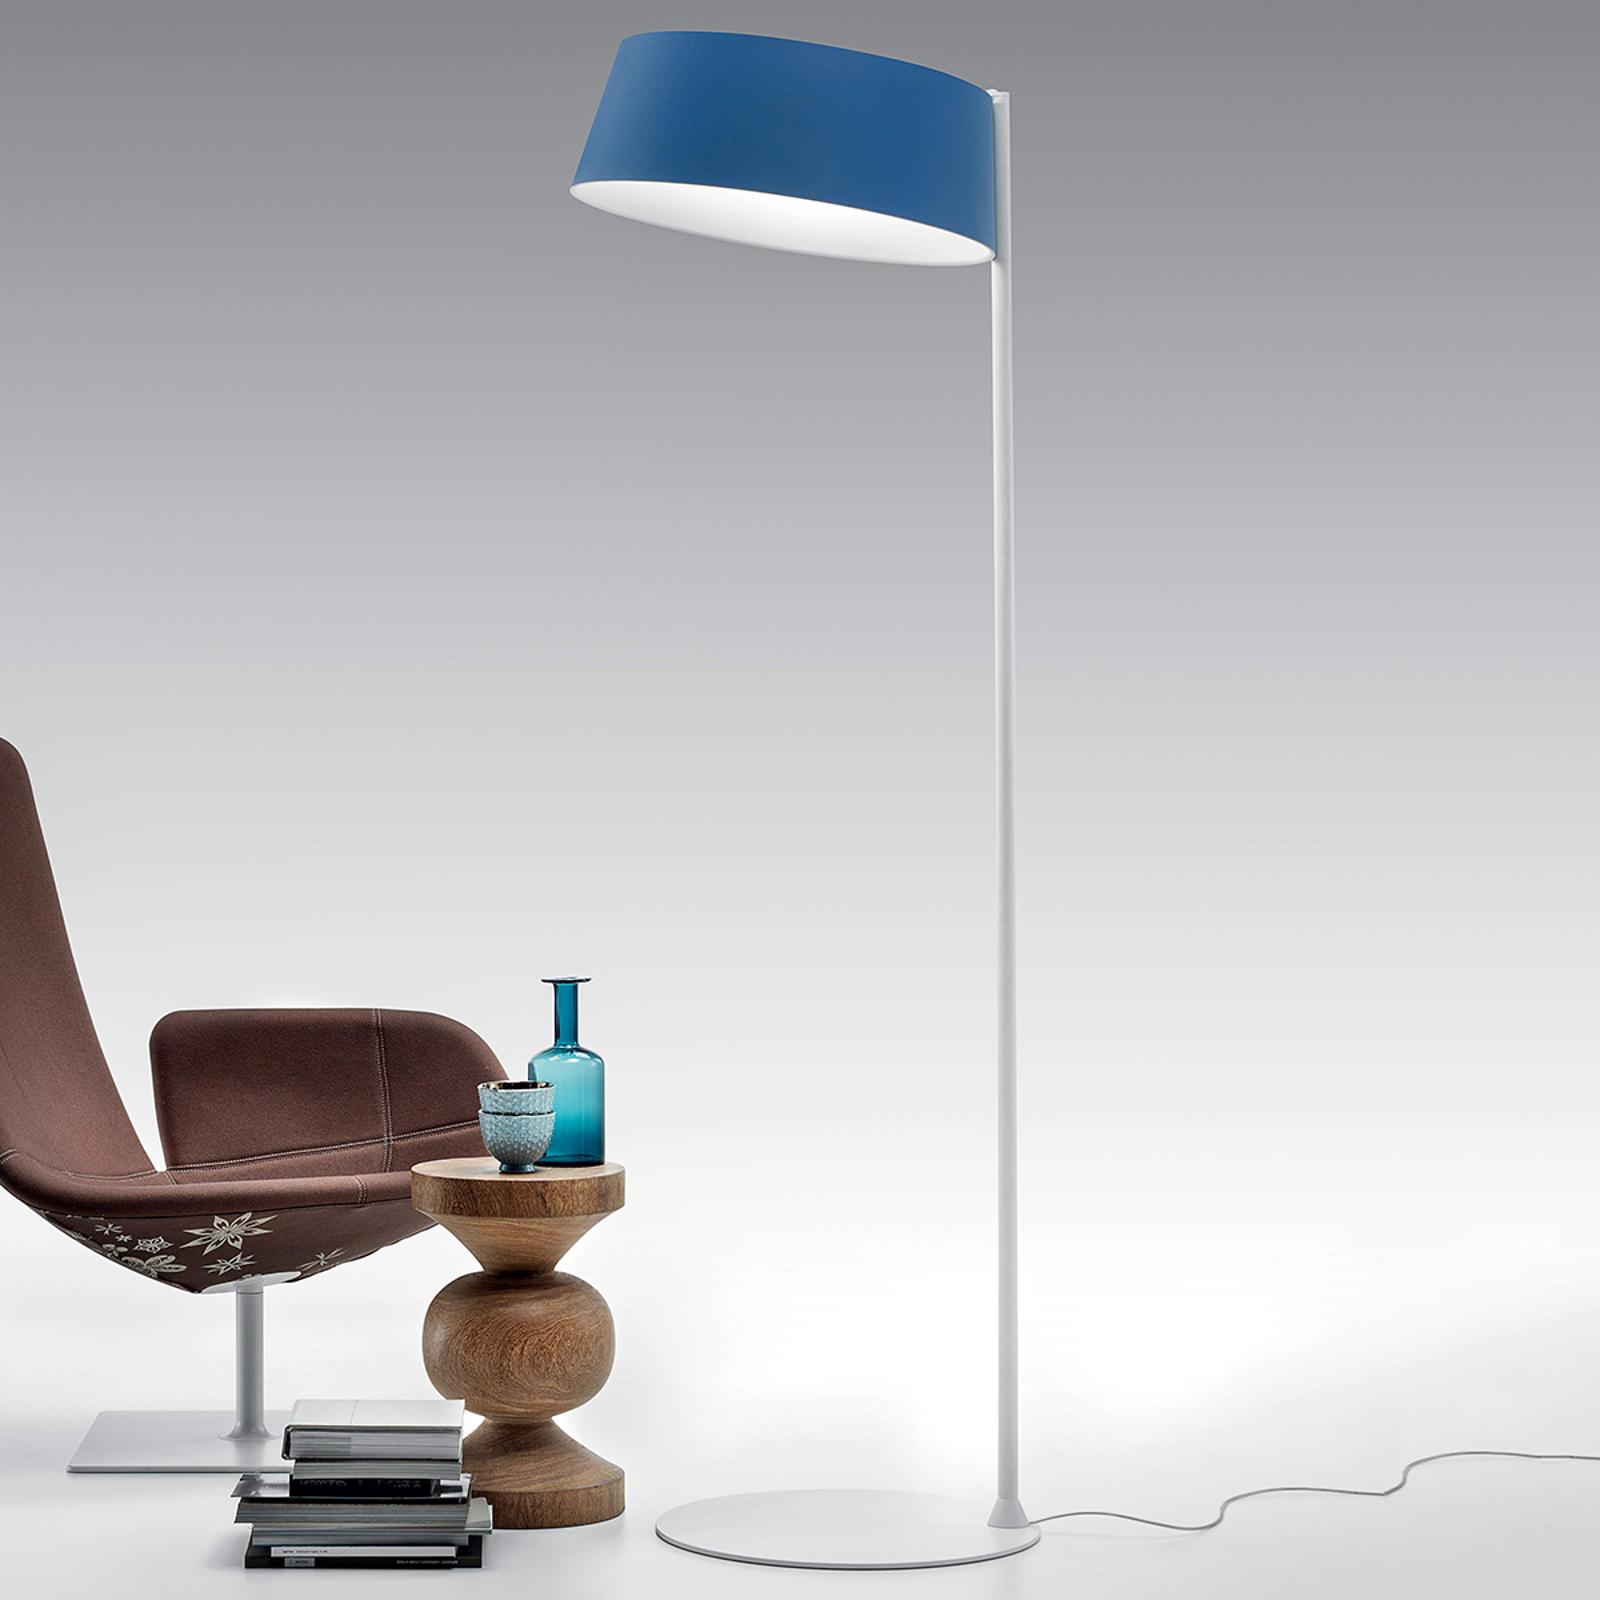 In azuurblauw ontworpen LED vloerlamp Oxygen_FL2